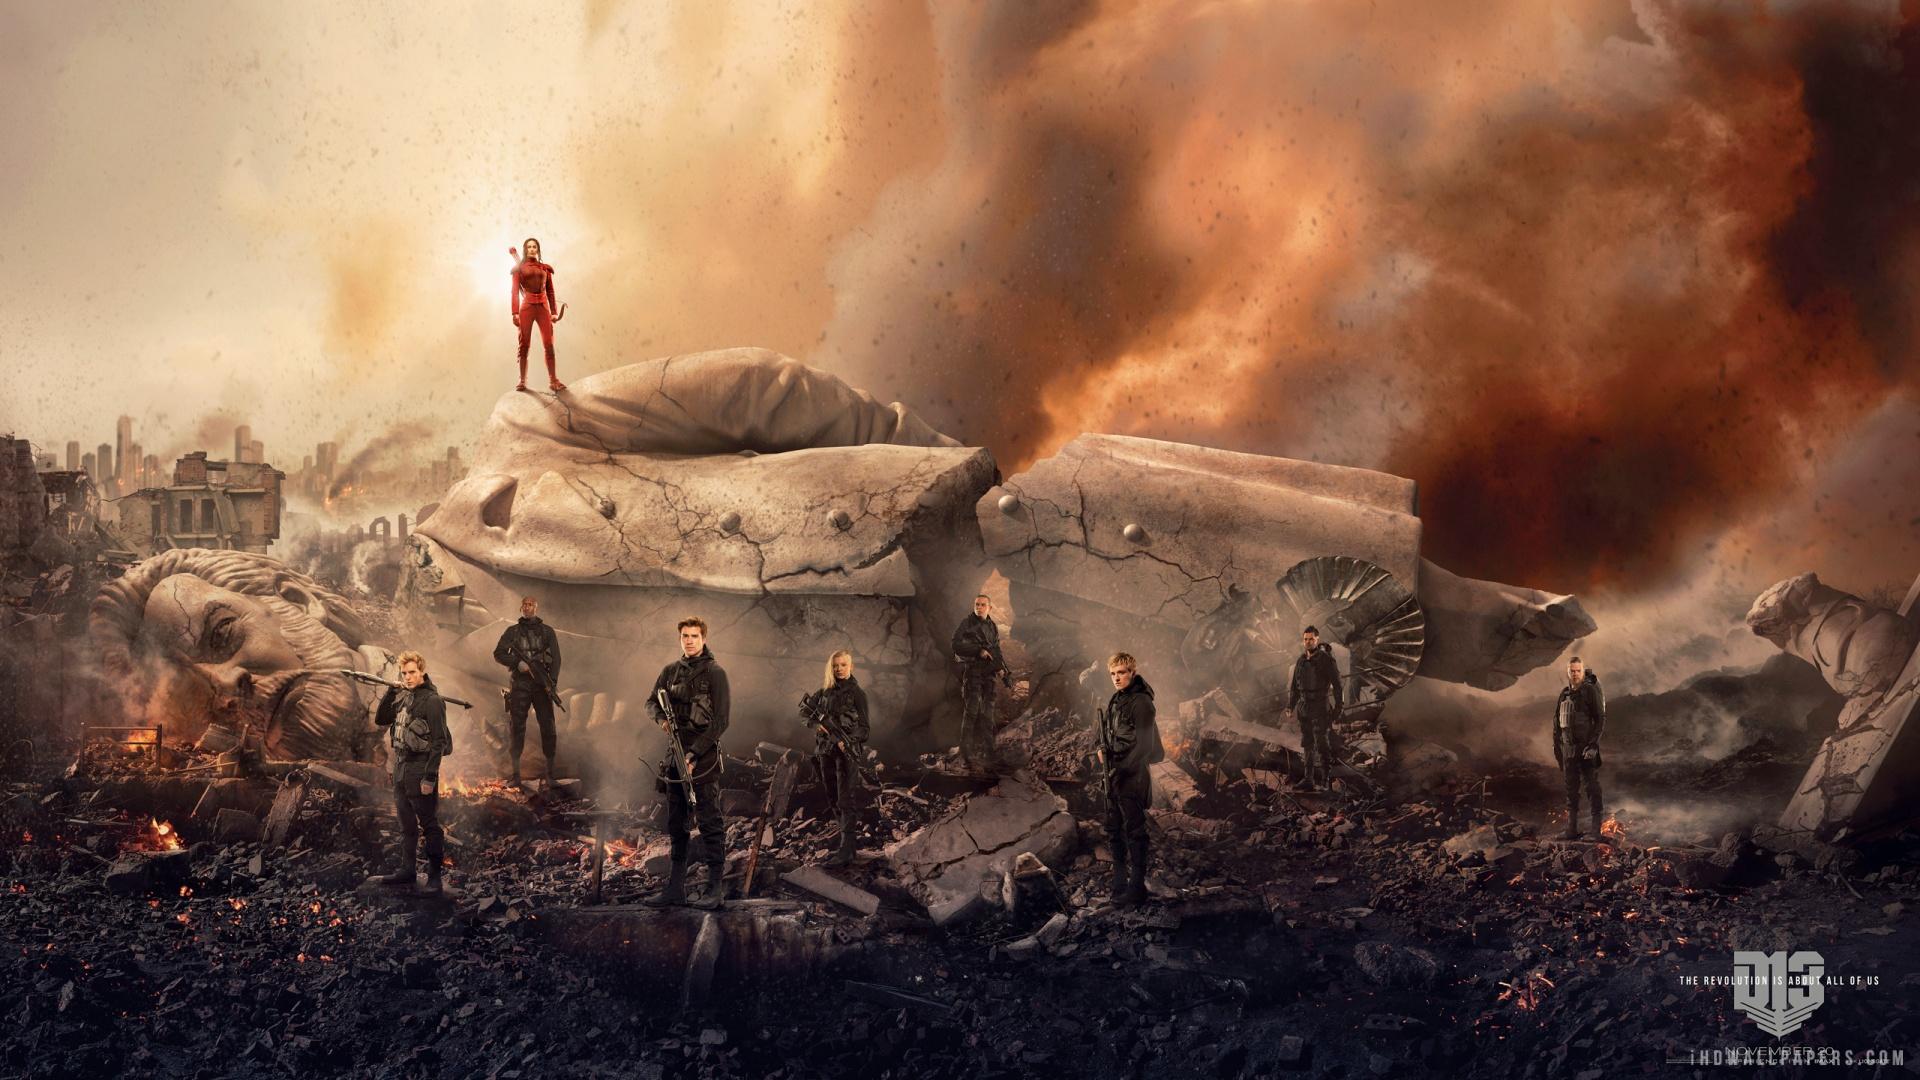 The Hunger Games Mockingjay Part 2 Movie 2015 HD Wallpaper   iHD 1920x1080